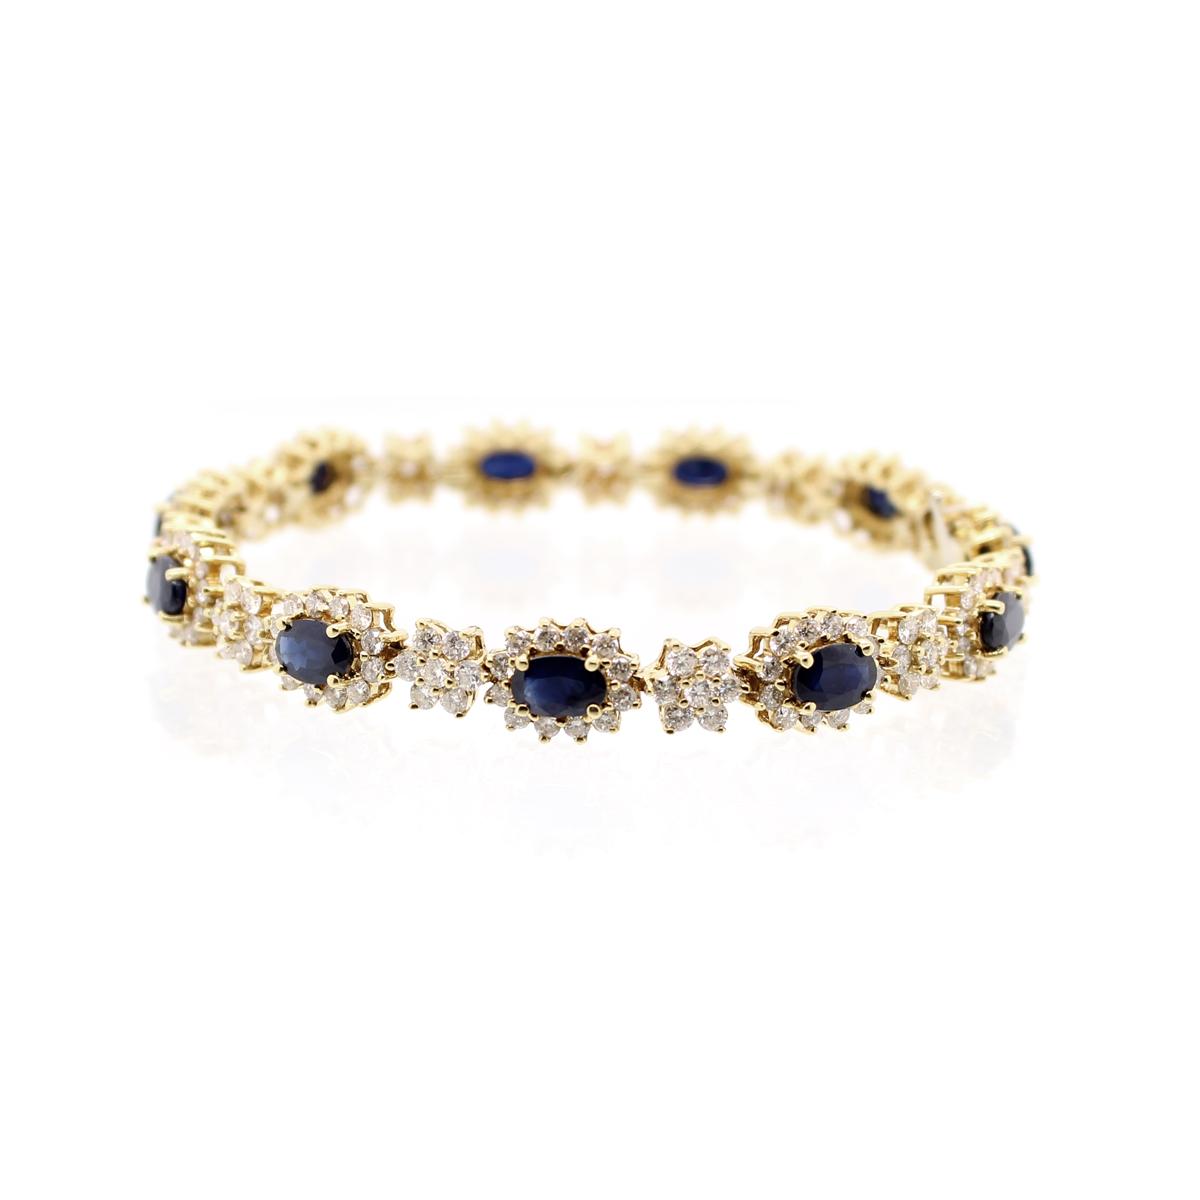 Estate 14 Karat Yellow Gold Diamond and Sapphire Link Bracelet